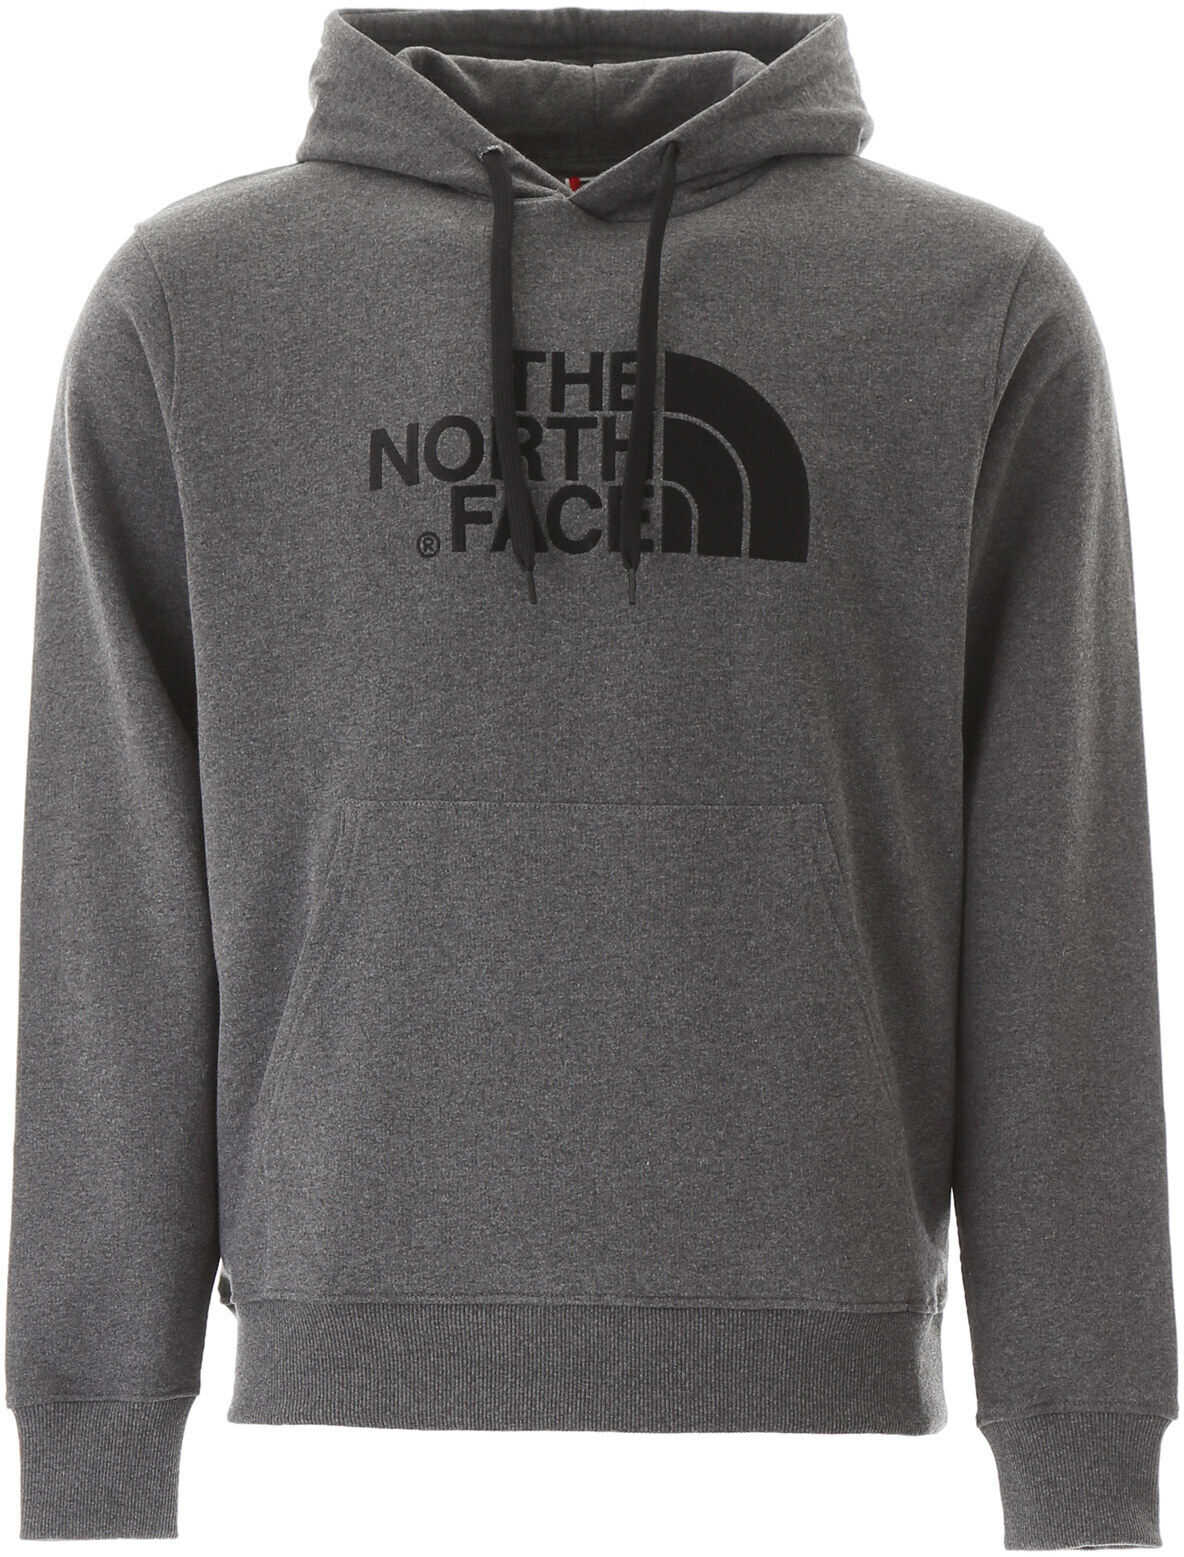 The North Face NF00A0TE MEDIUM GREYHTR BLACK